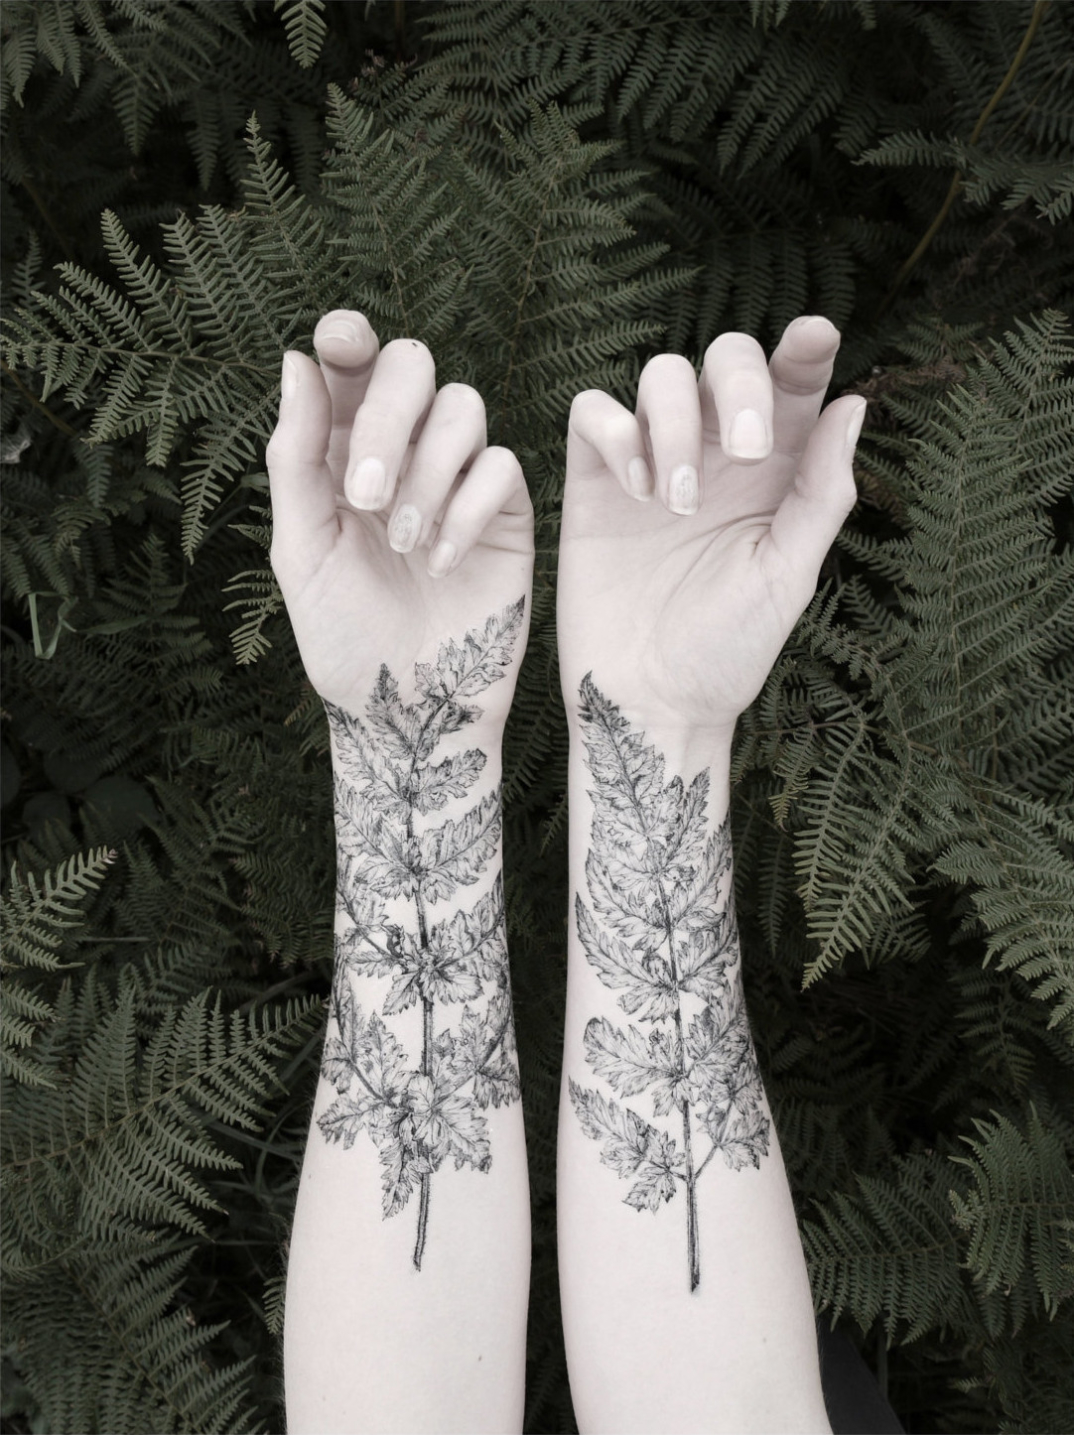 tatuaggi-temporanei-metallici-dorati-colorati-neri-esempi-moda-04